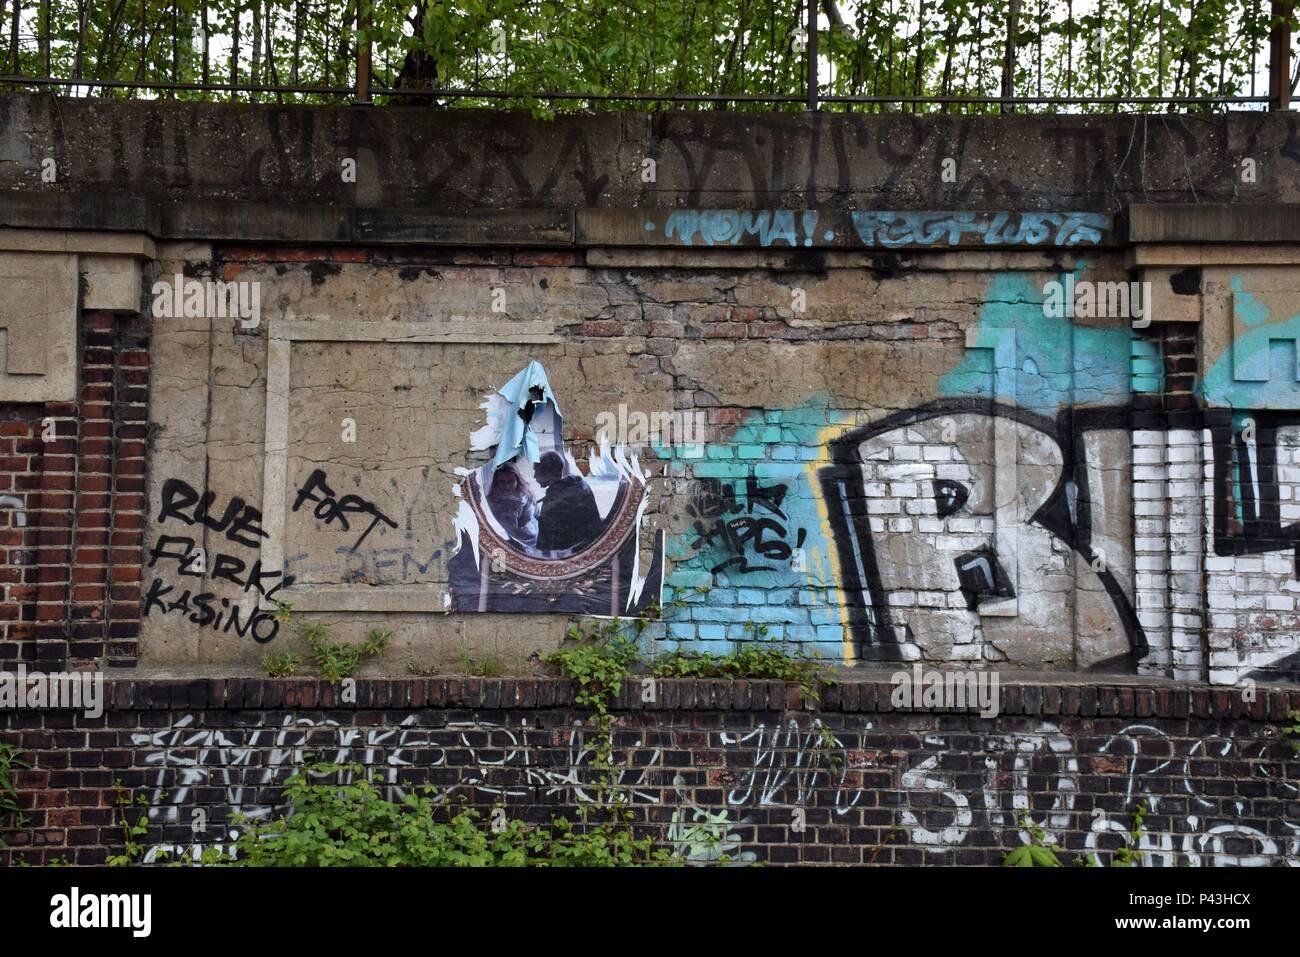 Graffiti on wall at main station on 29.04.2017 in Dortmund - Germany. | usage worldwide - Stock Image